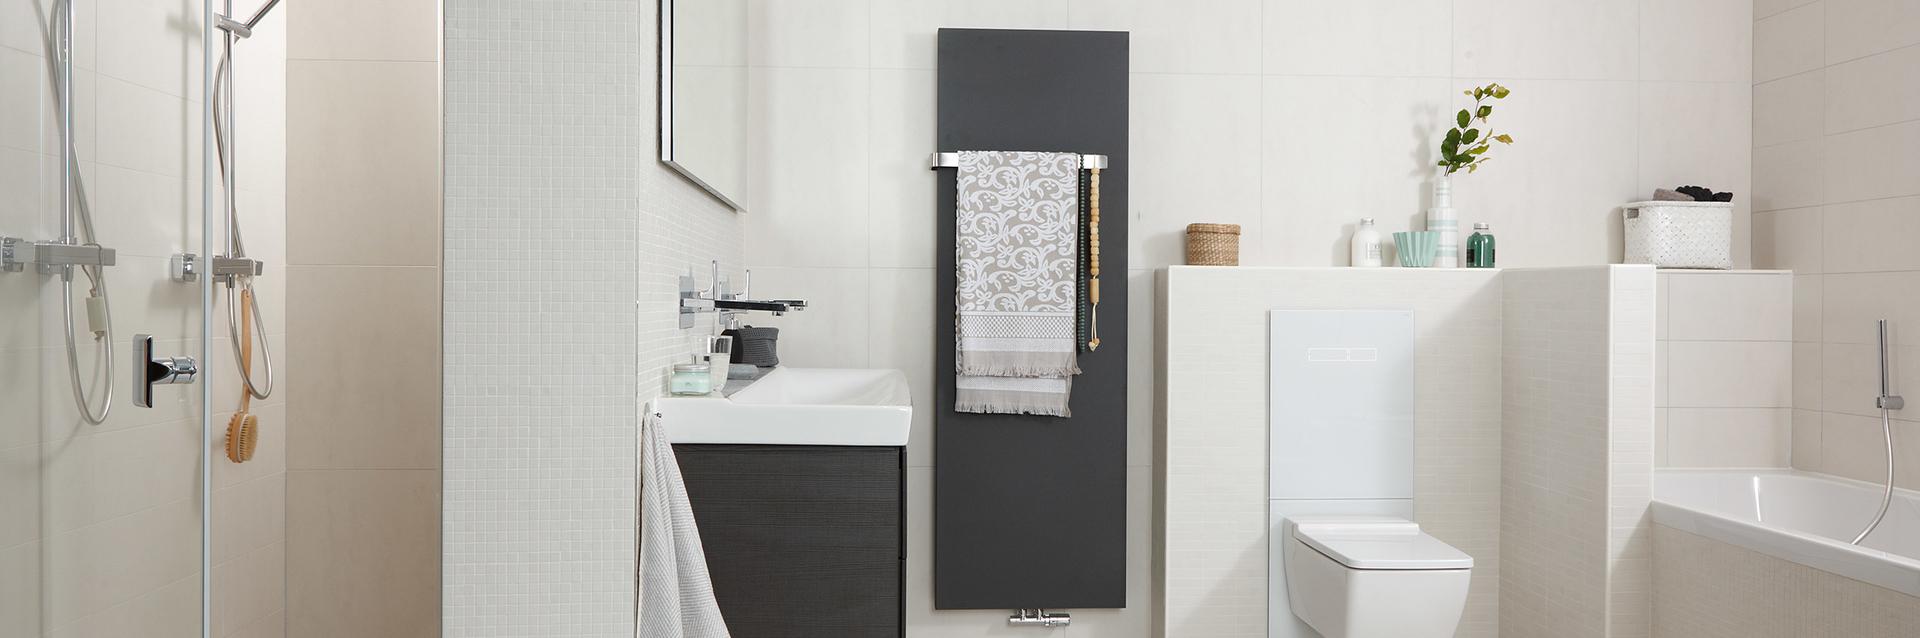 Witte badkamer - Witte badkamer